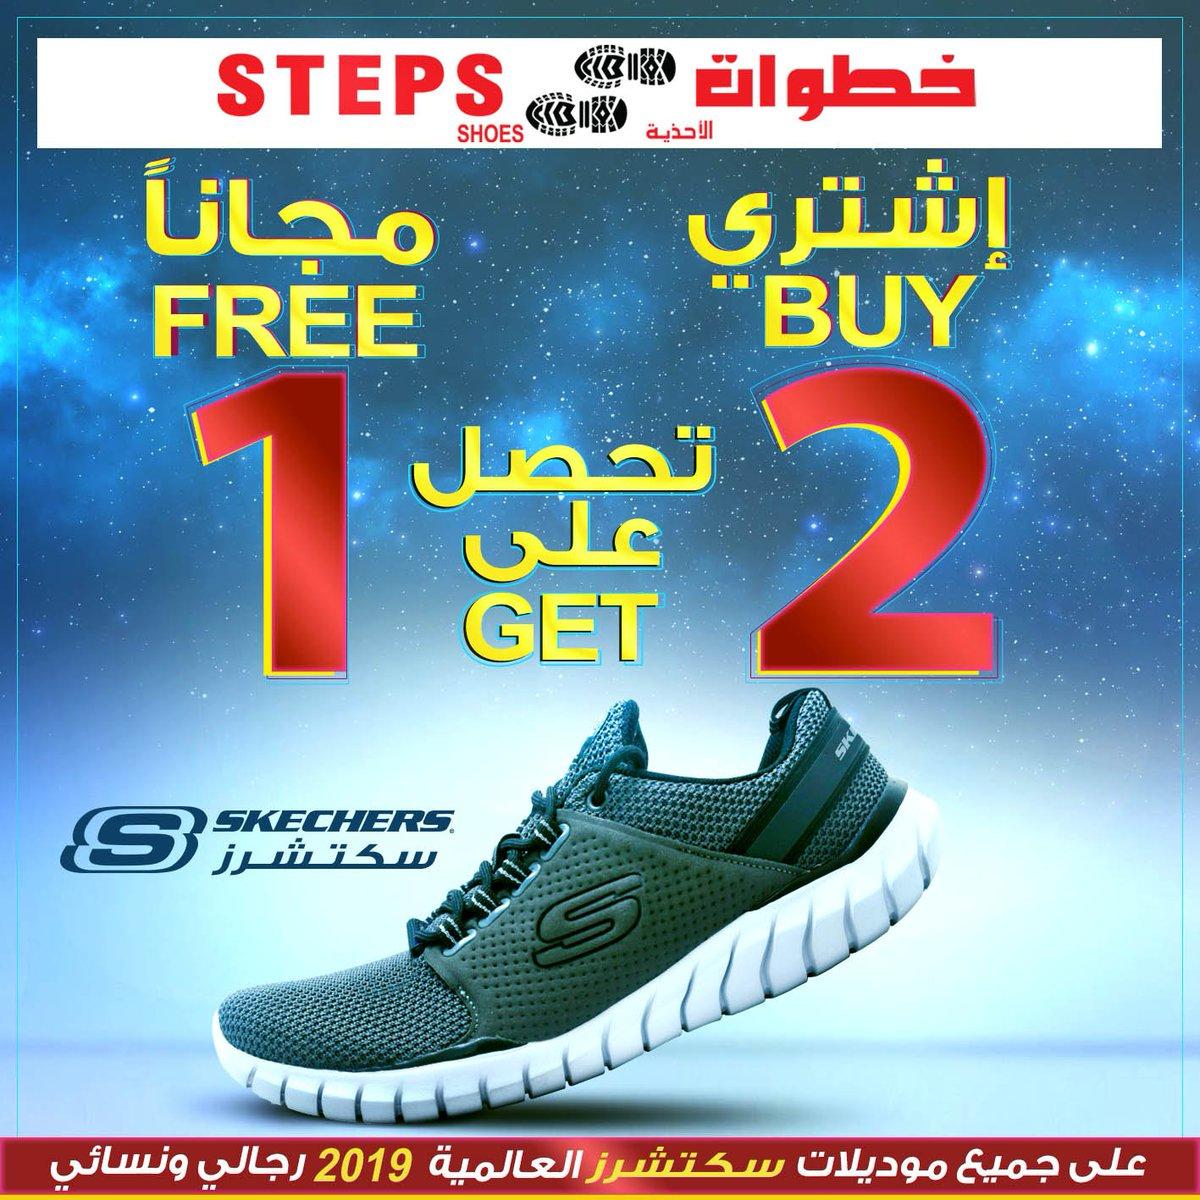 4944bef7c خطوات الأحذية (@ShoesSteps) | Twitter